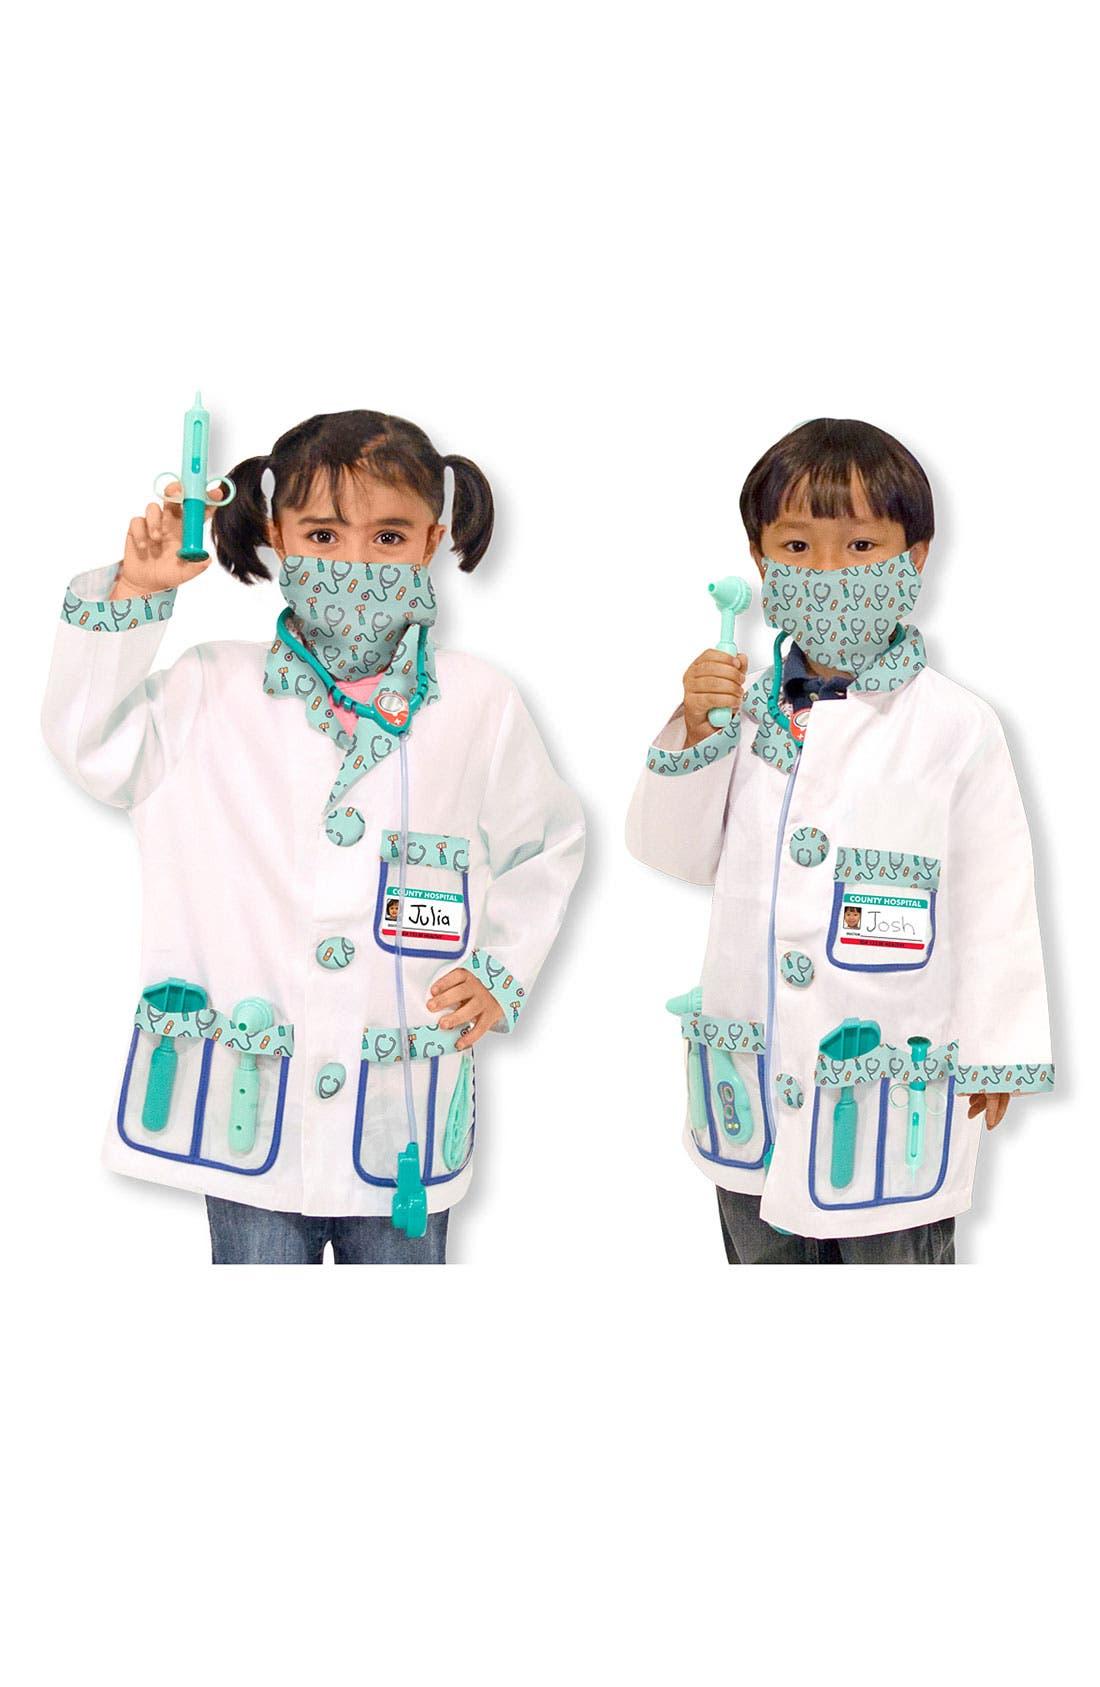 Melissa & Doug 'Doctor' Costume (Toddler)